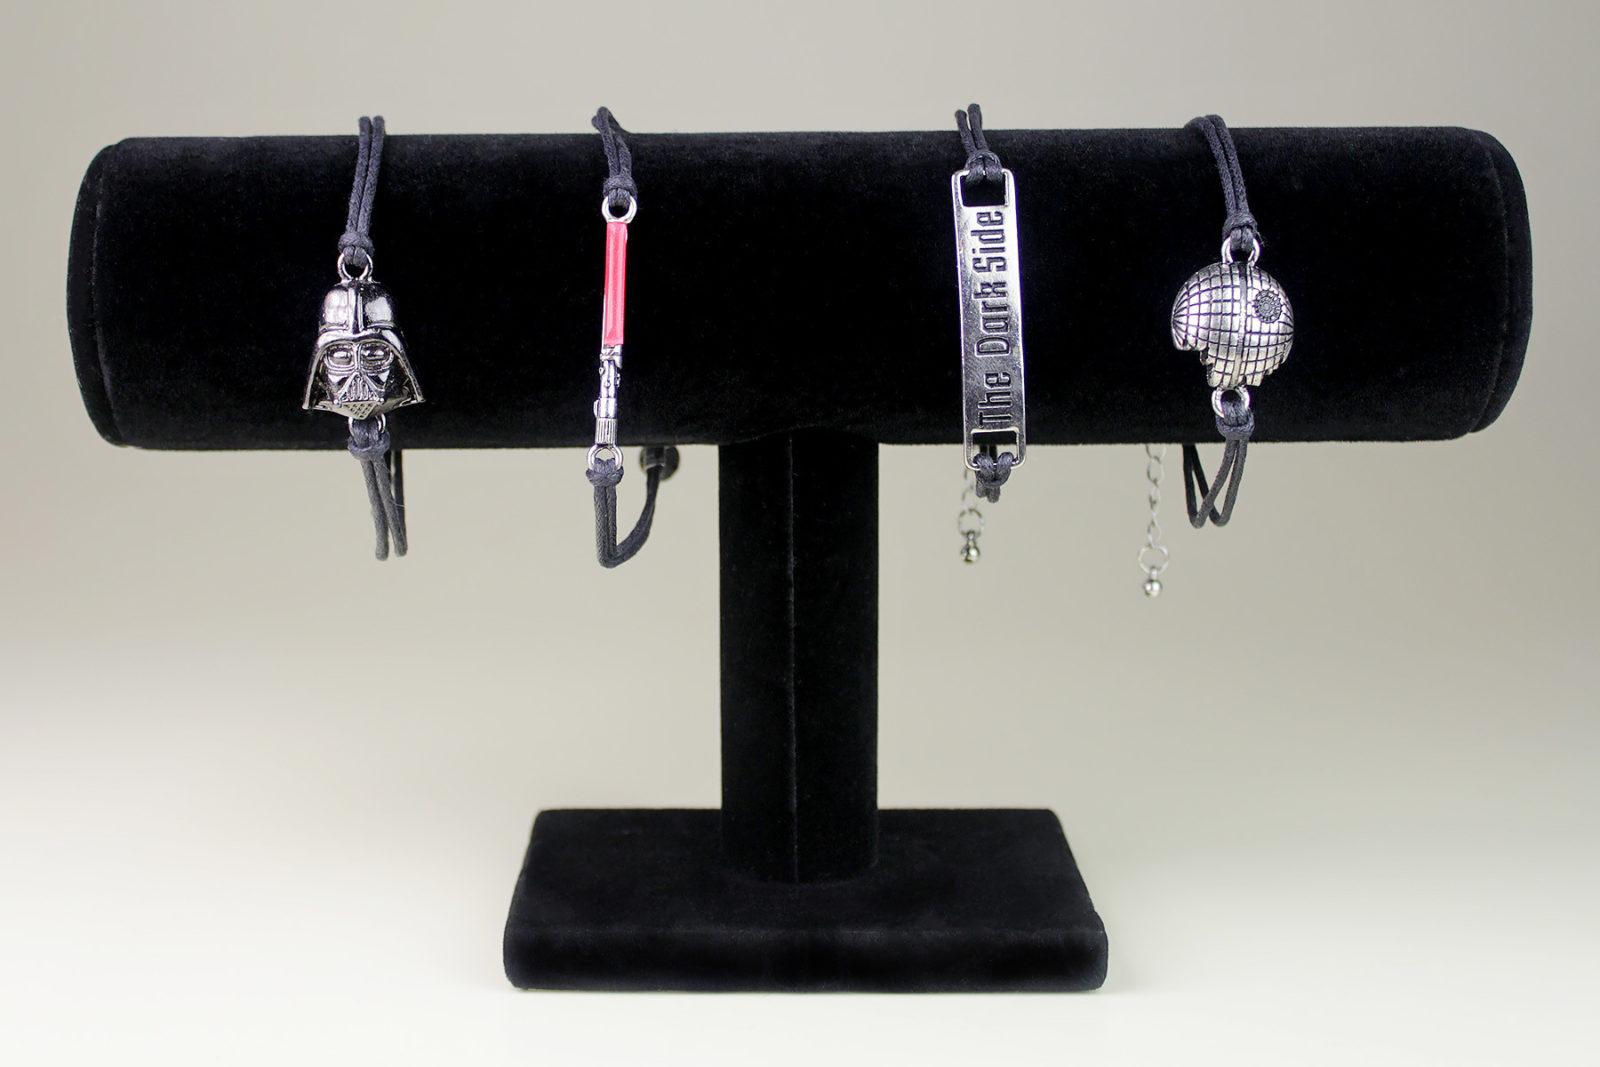 Star Wars Dark Side bracelet set by SG@NYC